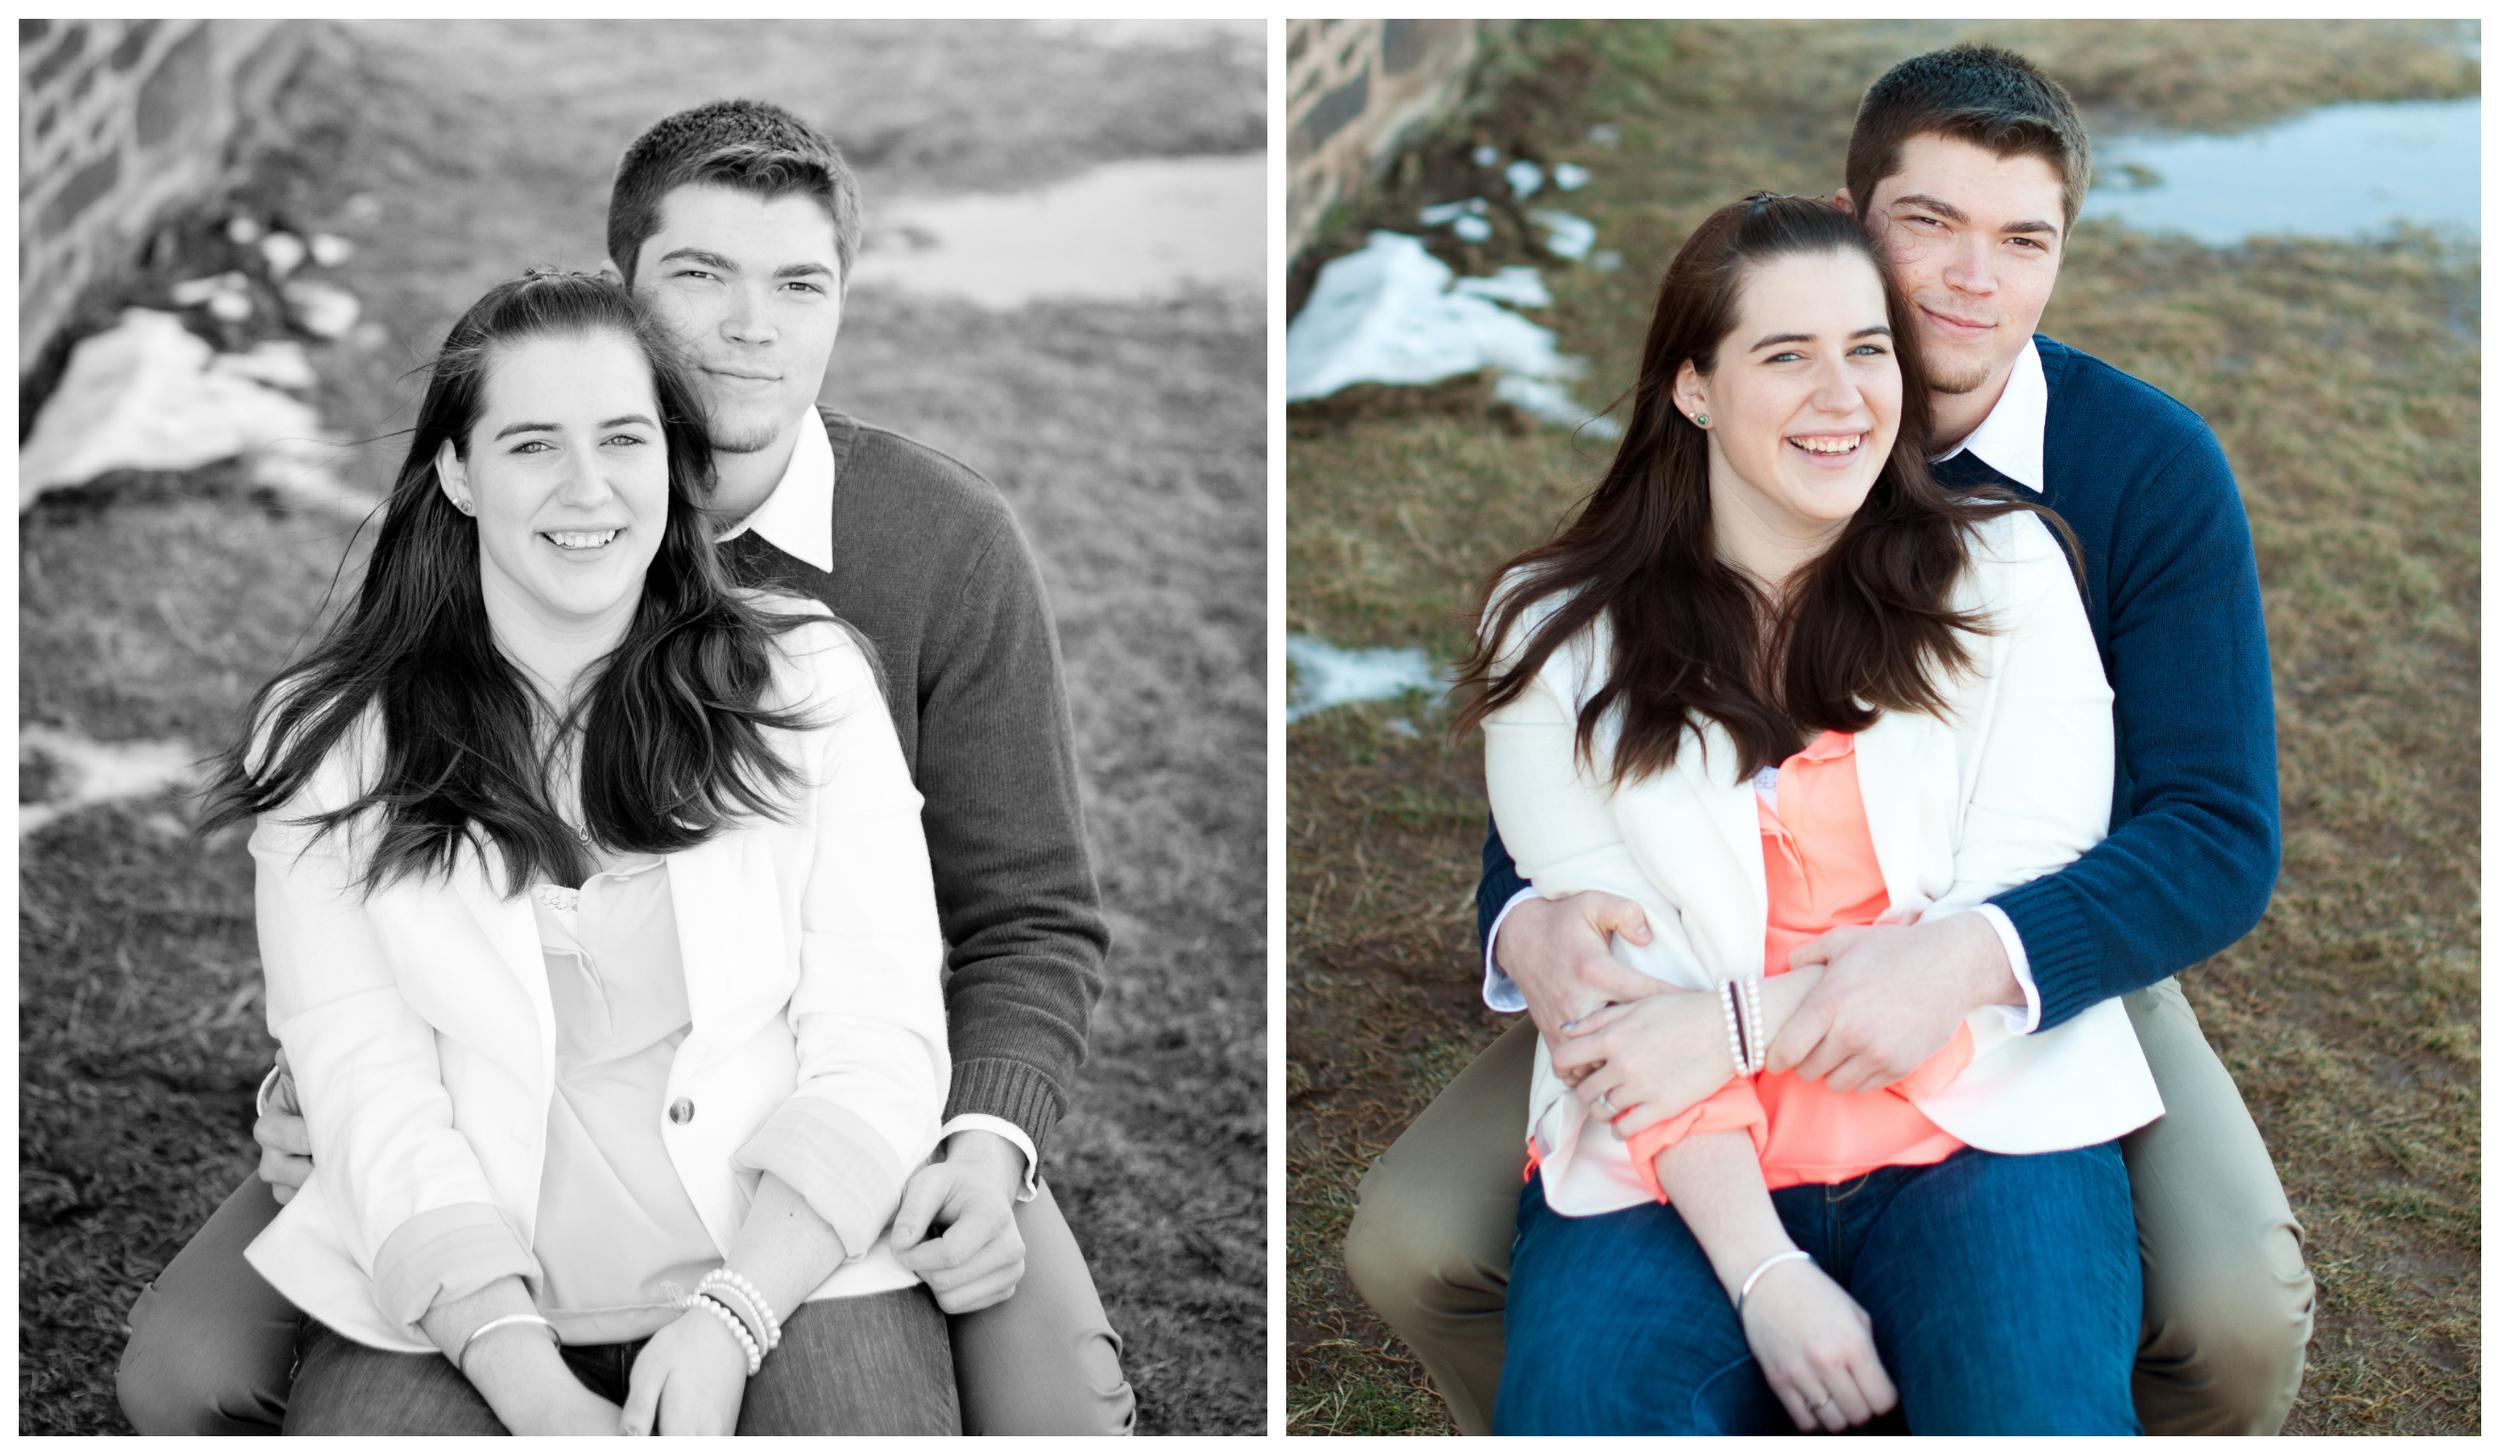 Collage4.jpg.jpg